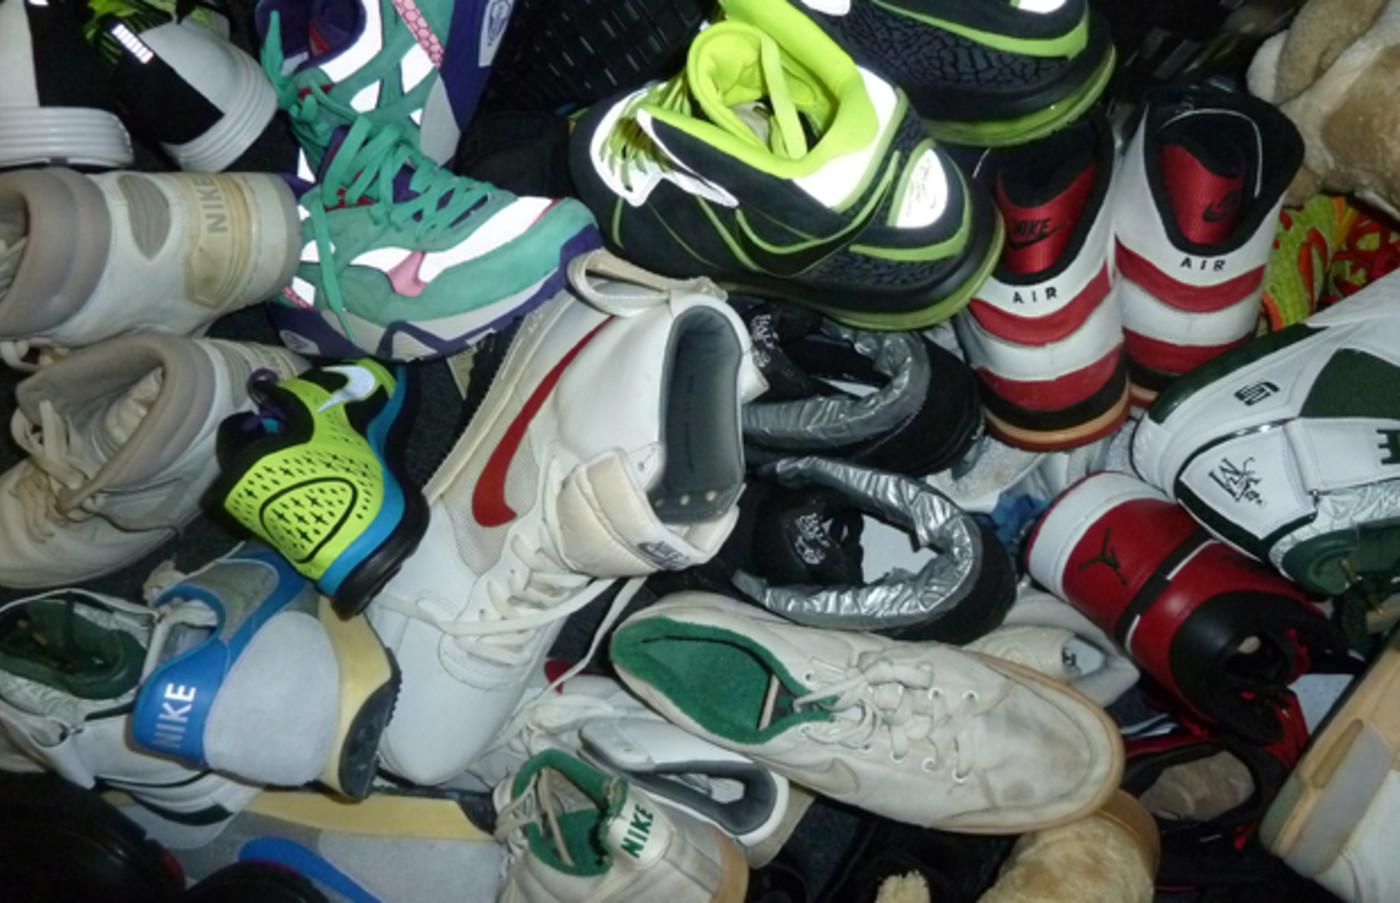 Adaptación vacío embrague  The 25 Coolest Sneakers in Russ Bengtson's Office | Complex